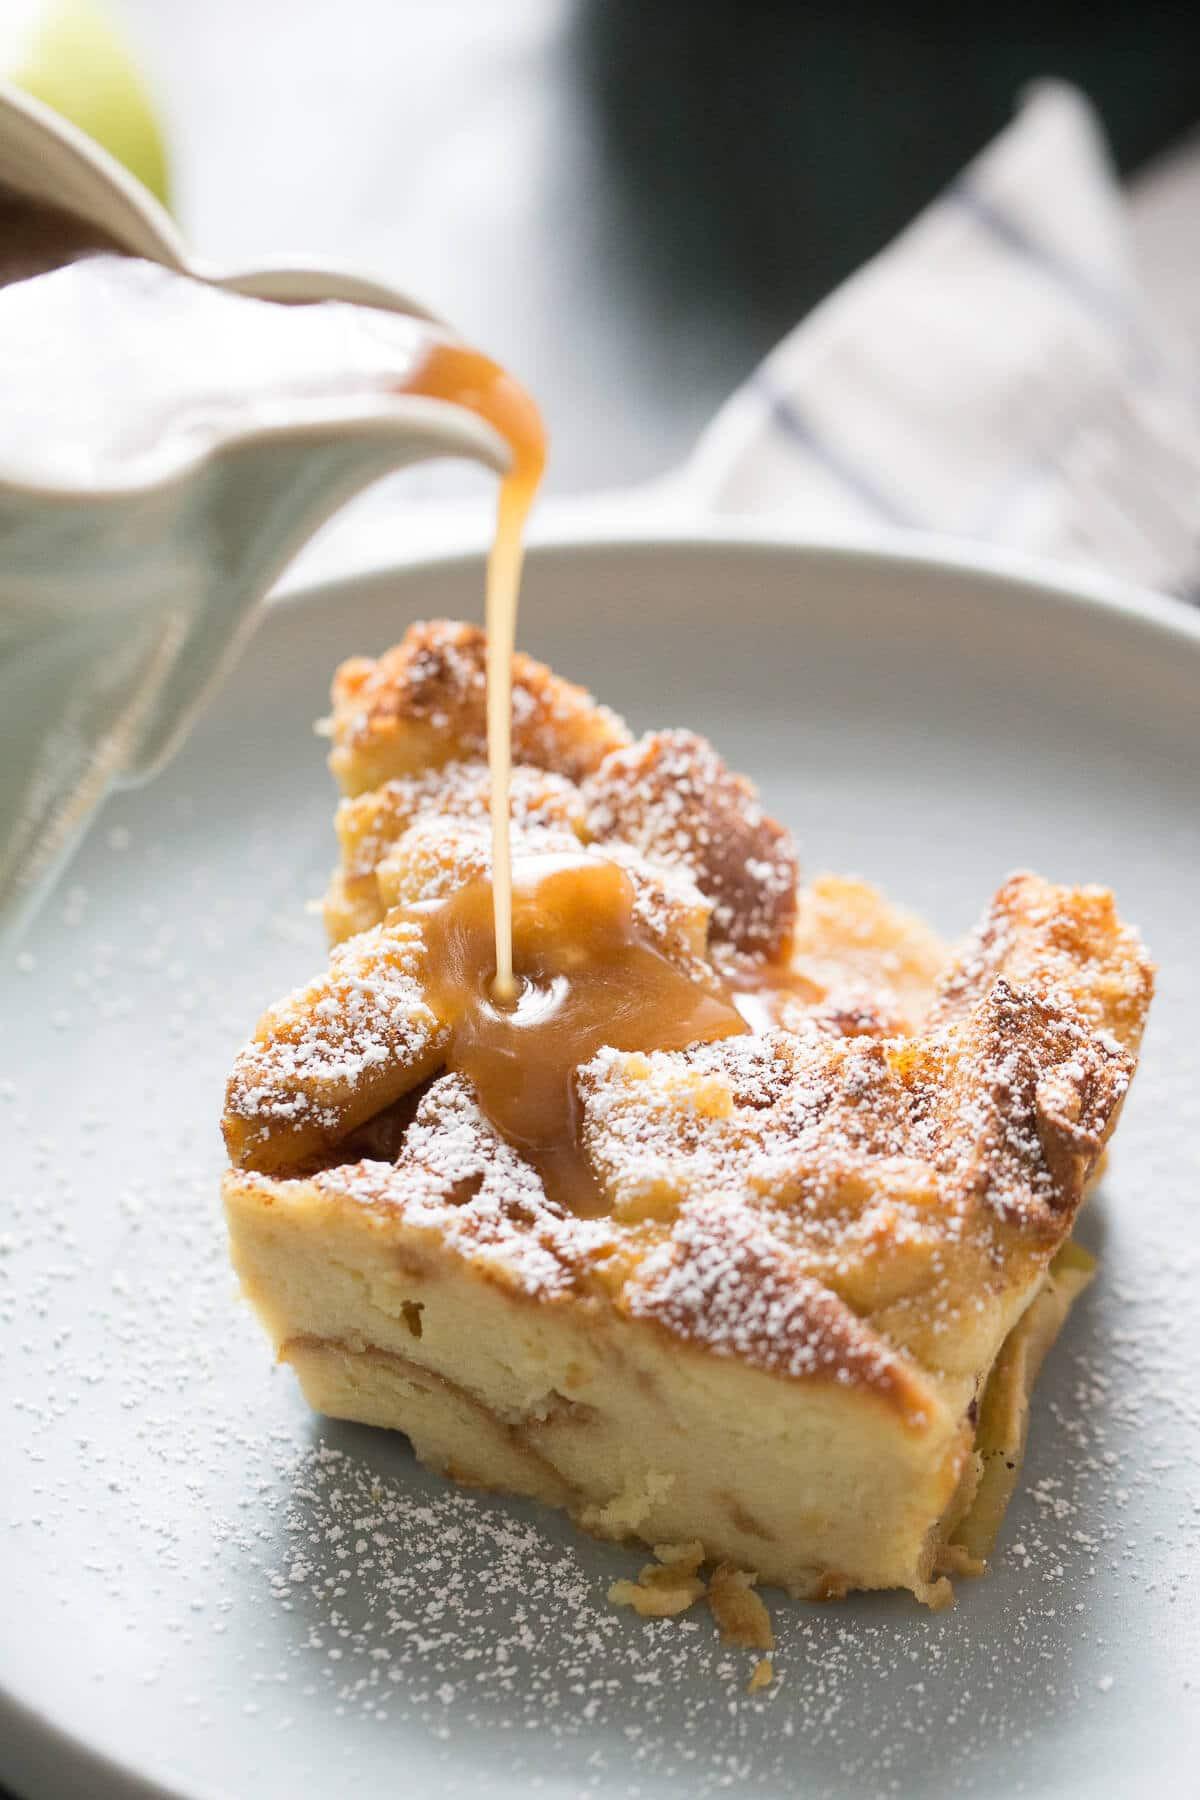 Recipe For Bread Pudding  Apples Foster Bread Pudding Recipe LemonsforLulu